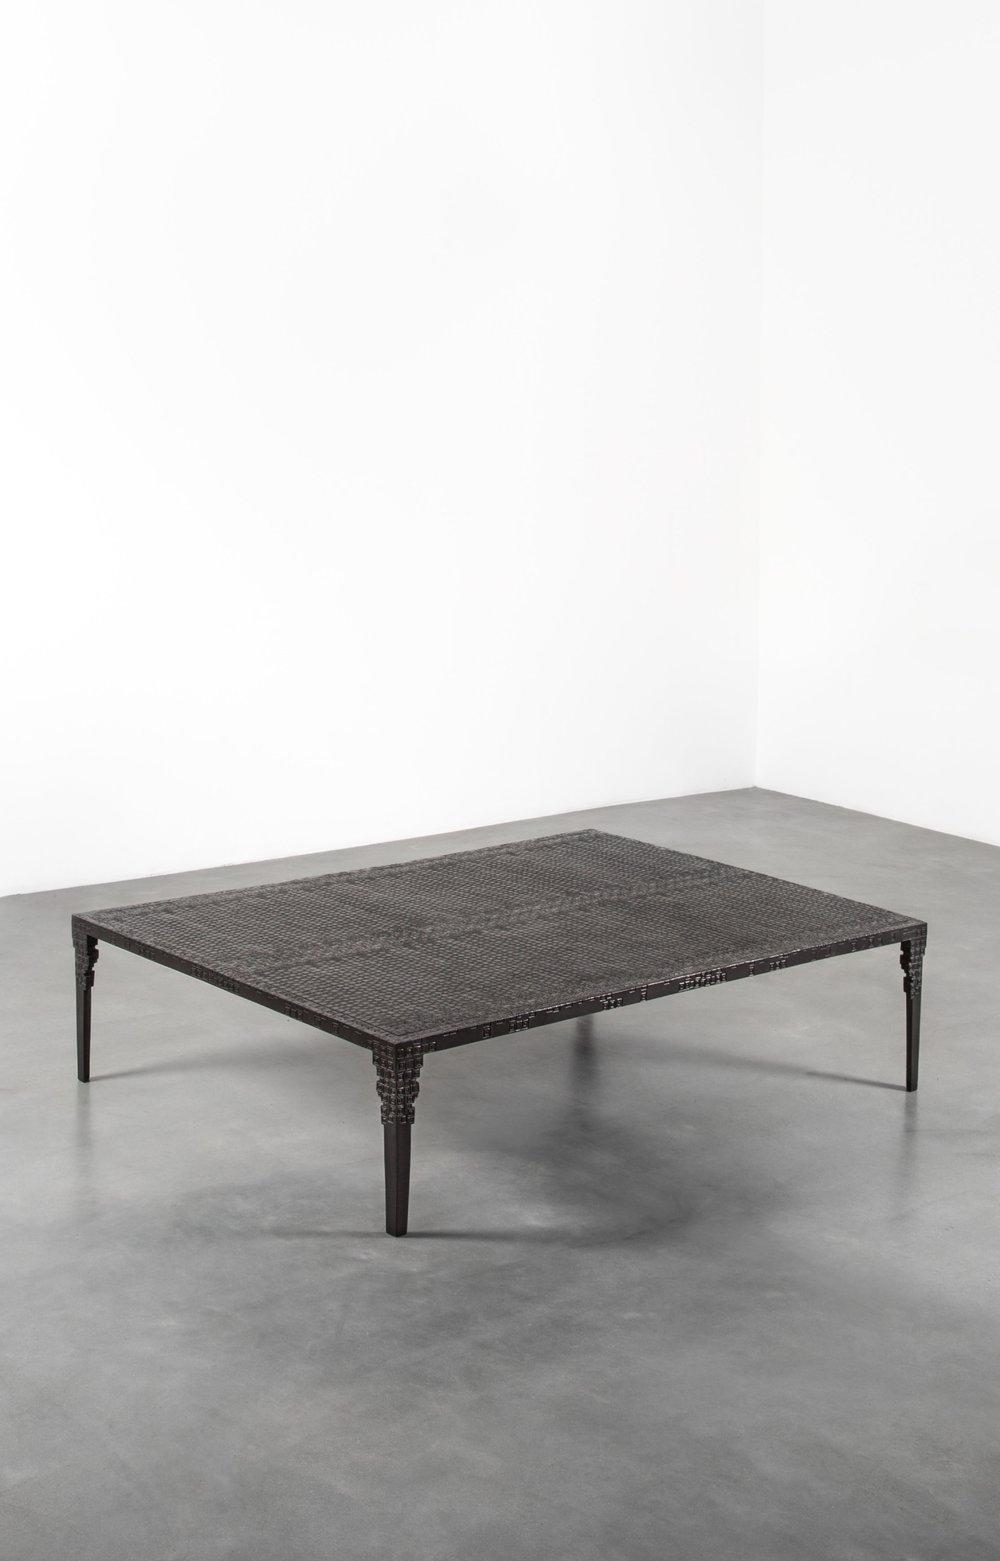 DONAT_Table Basse Koumba_01.jpg